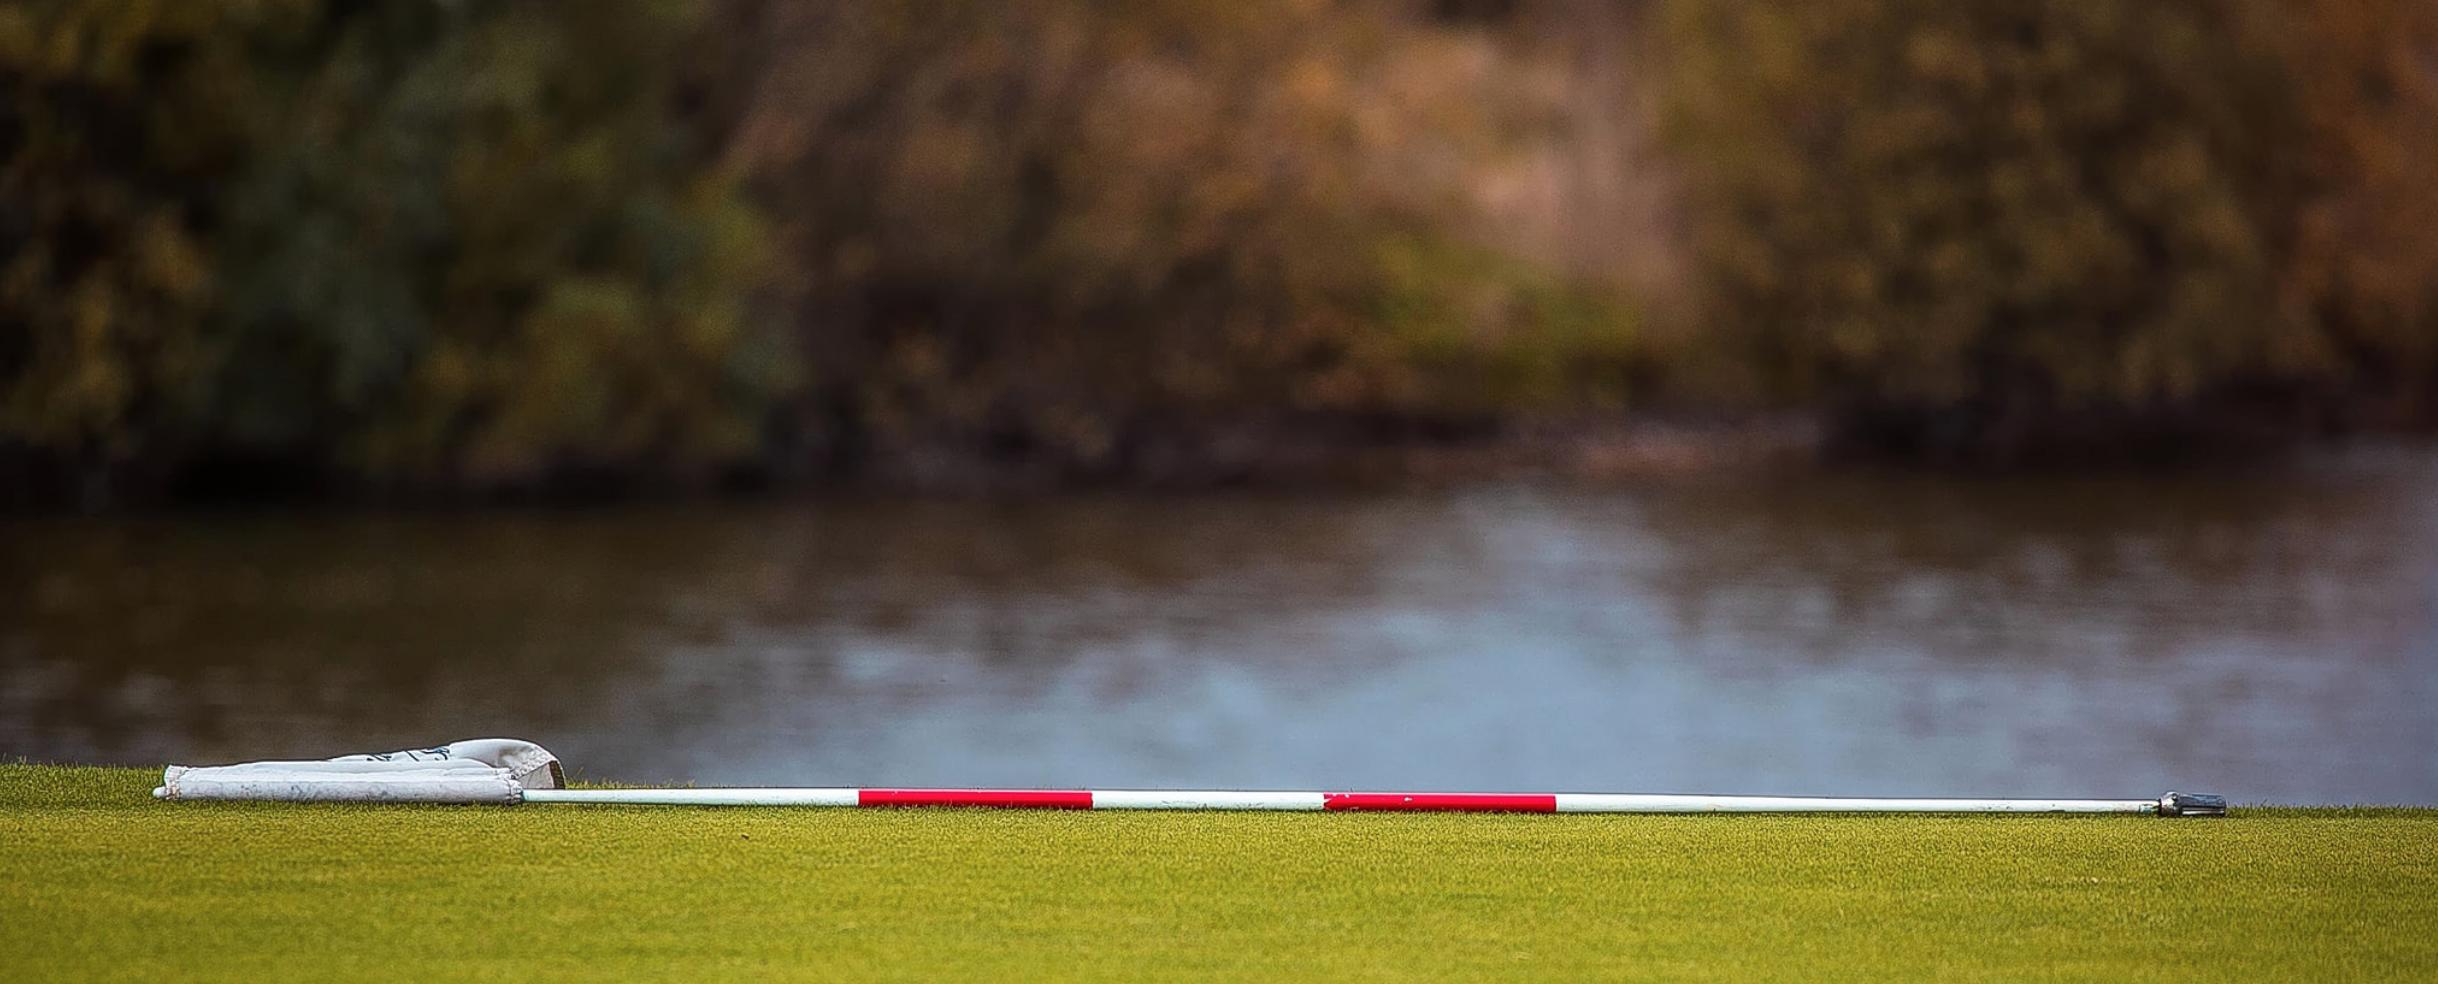 Barloeseborg golf club picture